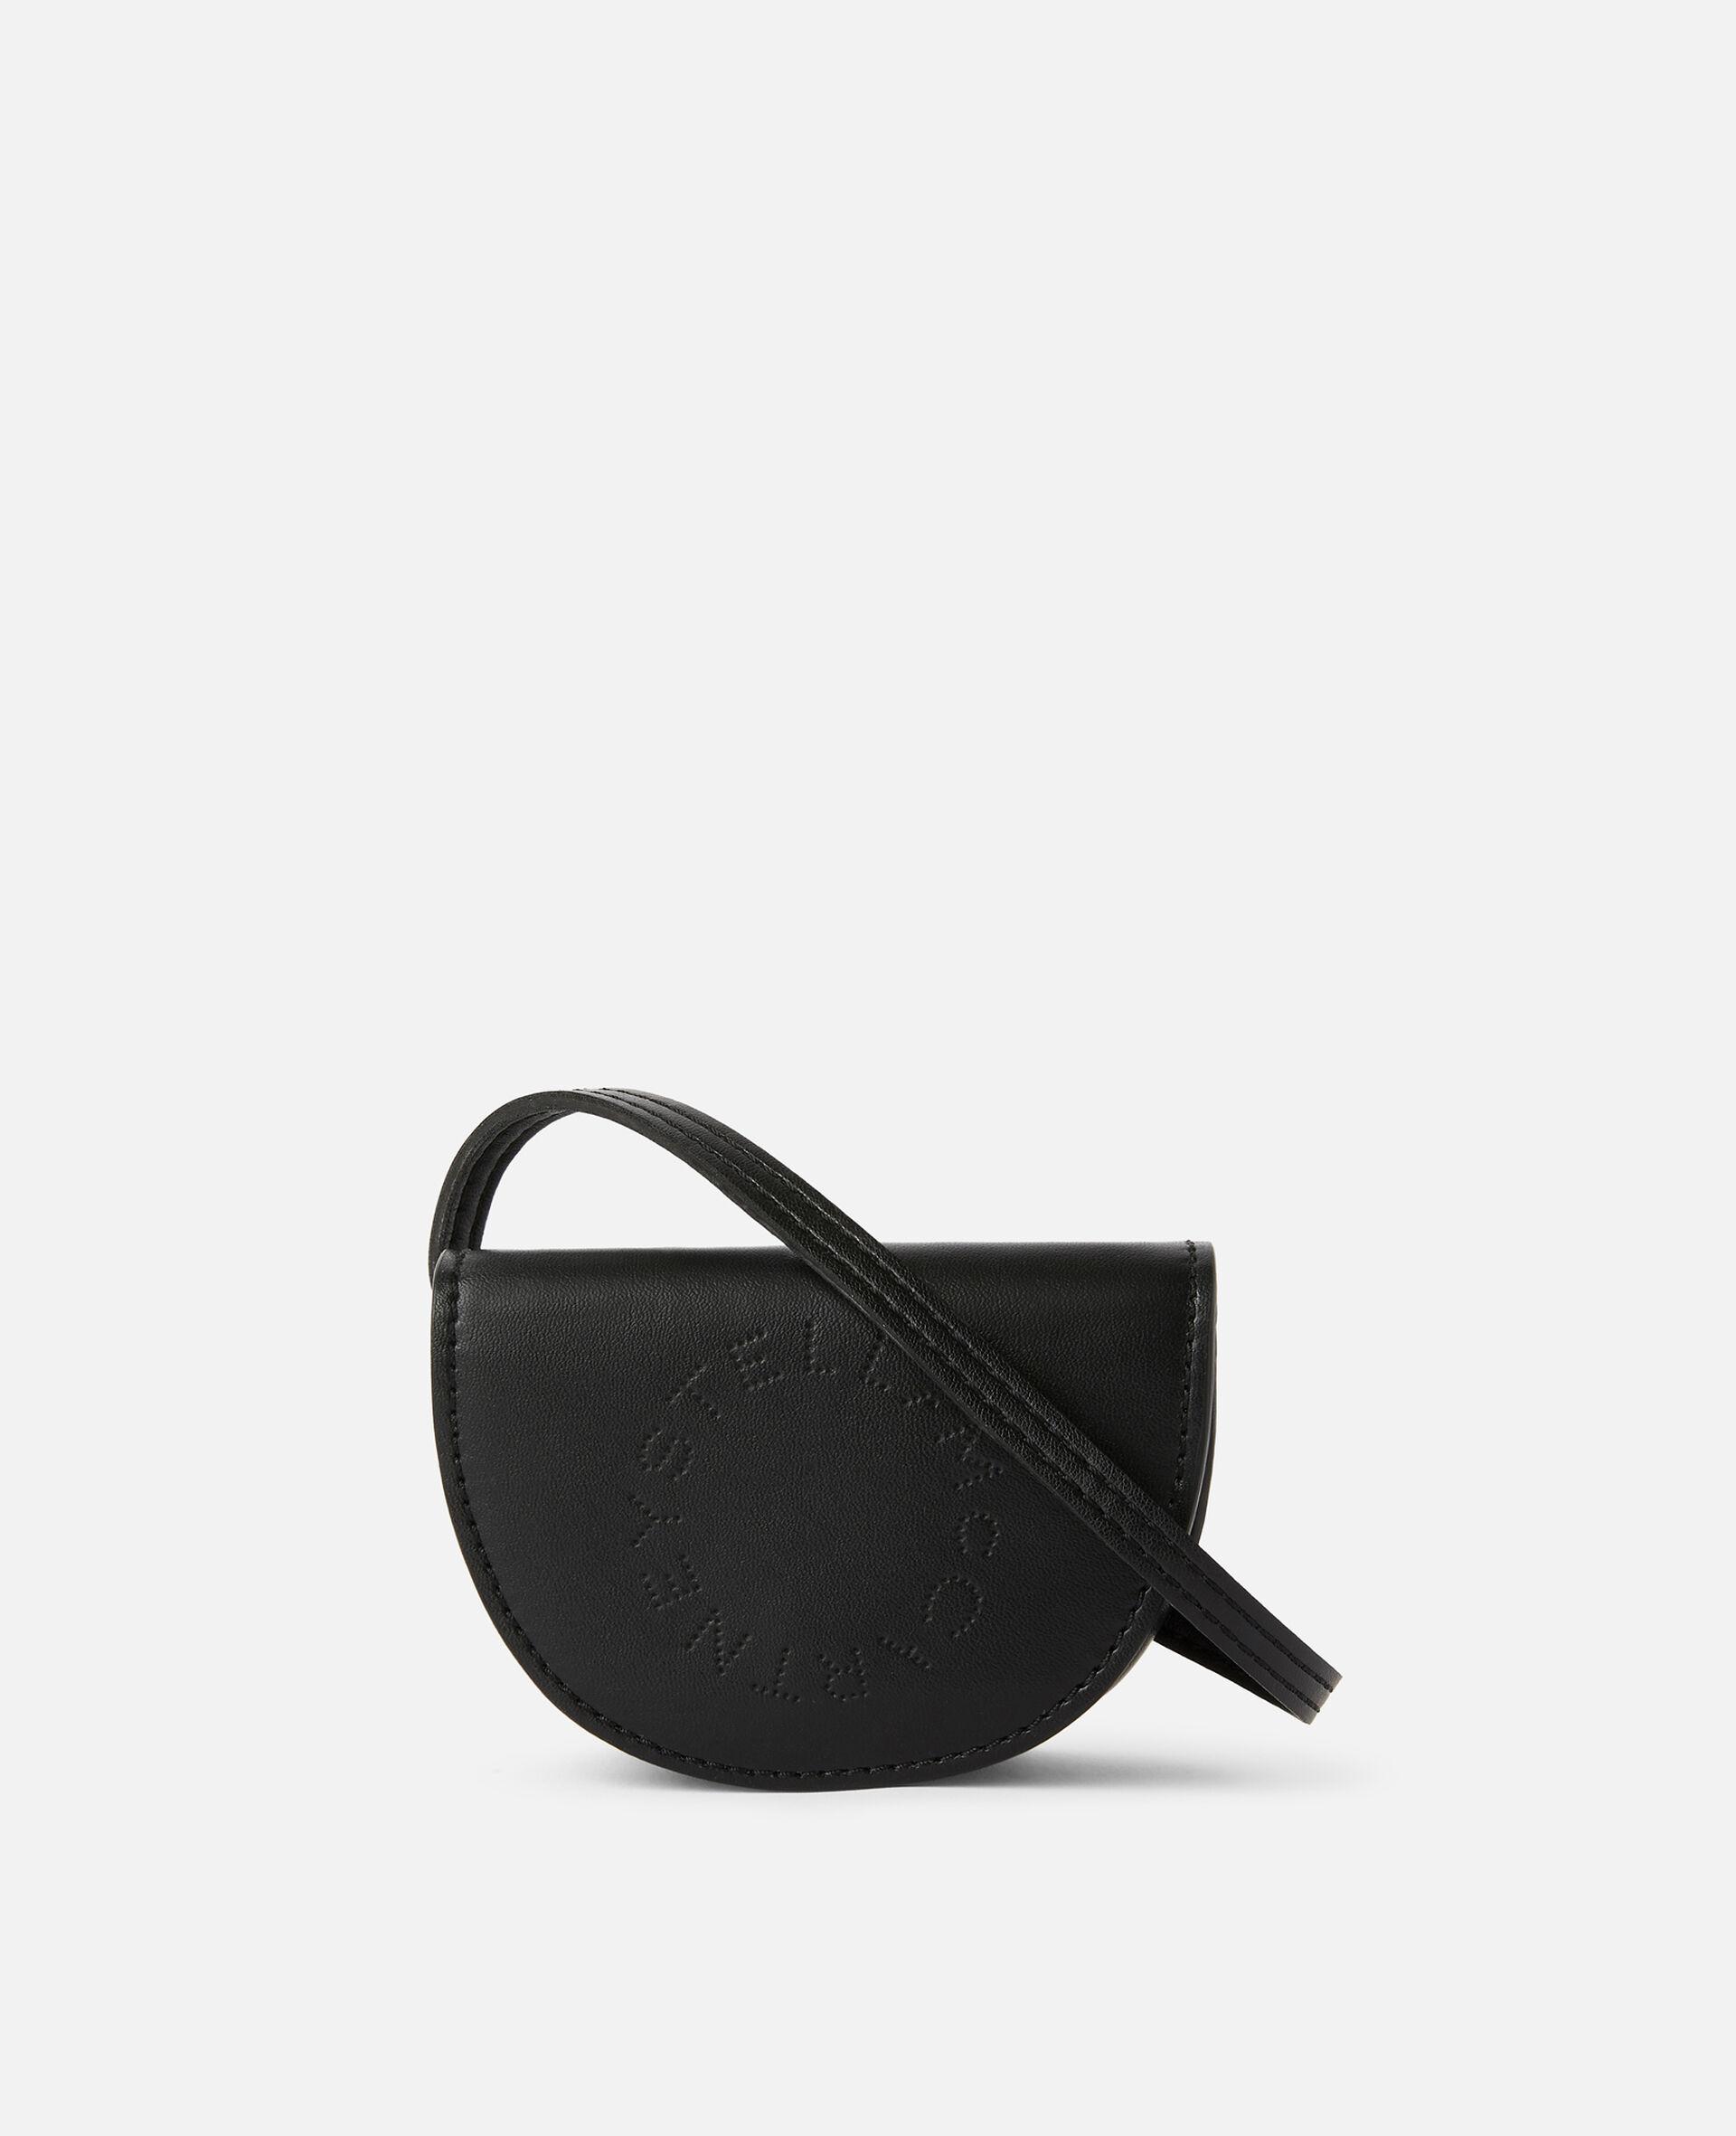 Sac ceinture Marlee miniature-Noir-large image number 0